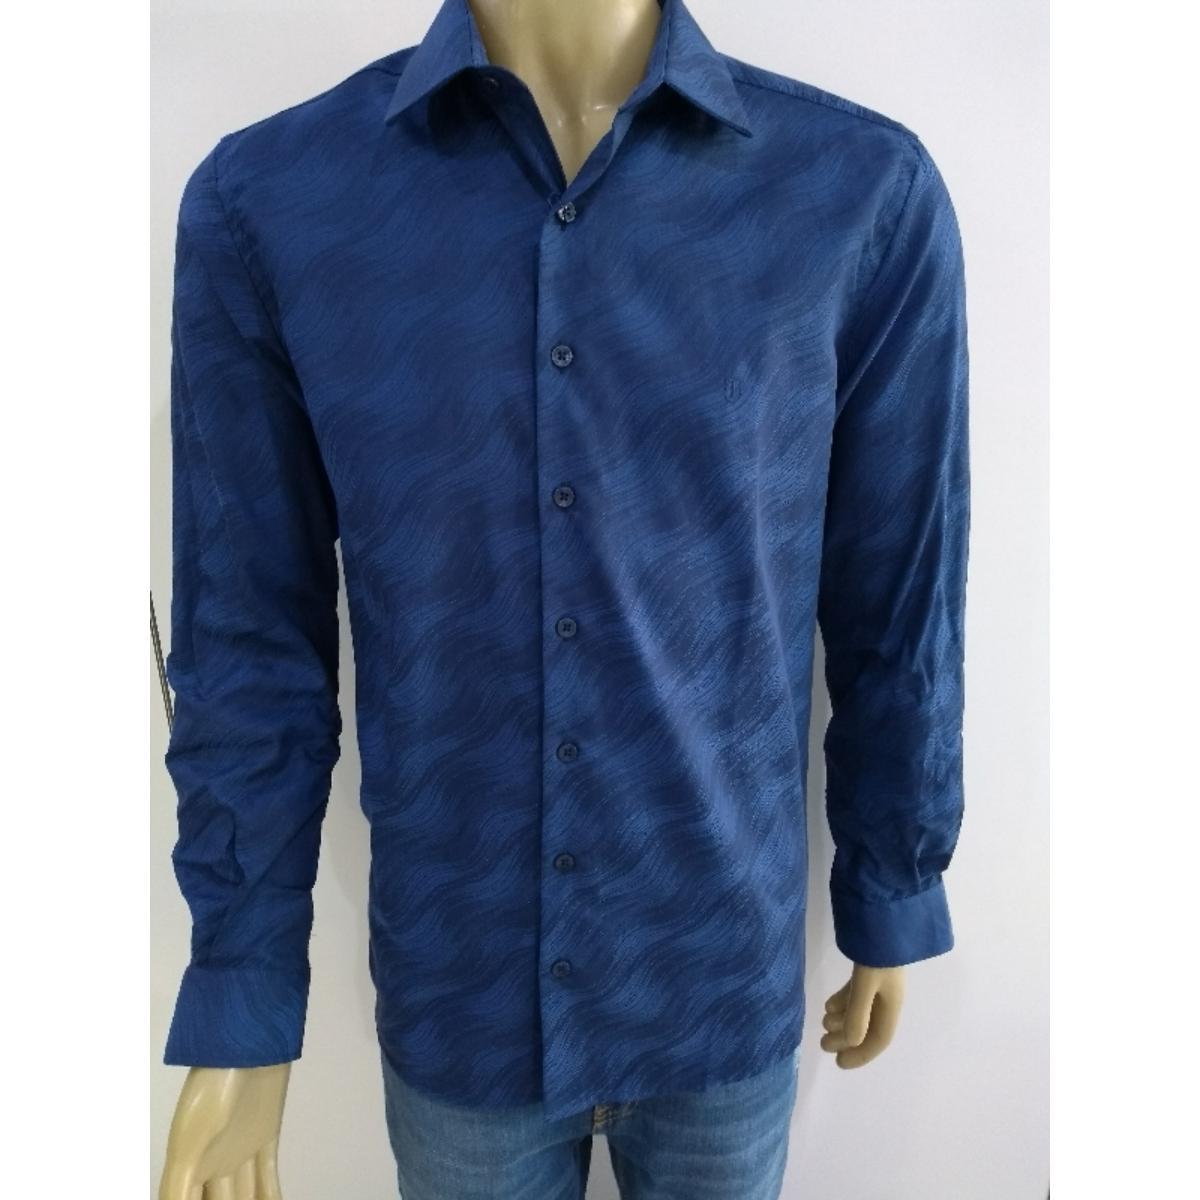 Camisa Masculina Individual 53.03.0989 48 Azul